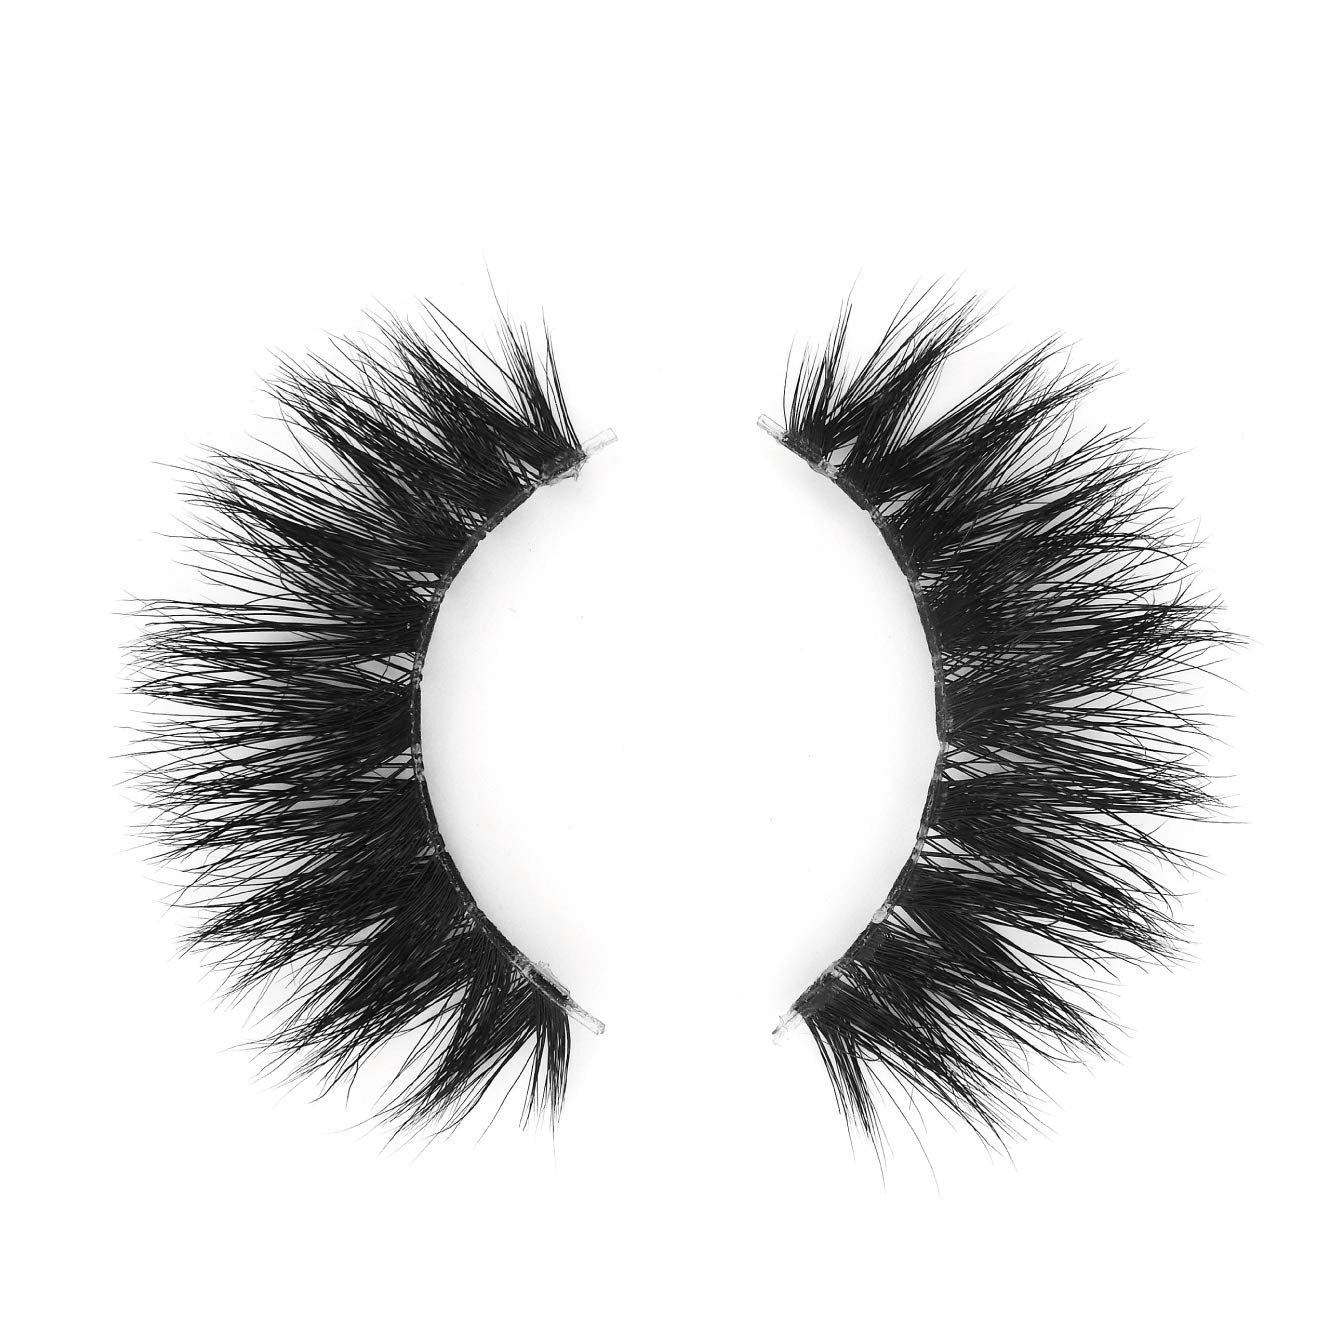 BEPHOLAN Mink Lashes 100% Siberian Mink Fur Handmade False Eyelashes 3D Lashes Dramatic Reusable Handmade Fake Eyelashes Fake Eyelashes(XMZ10)